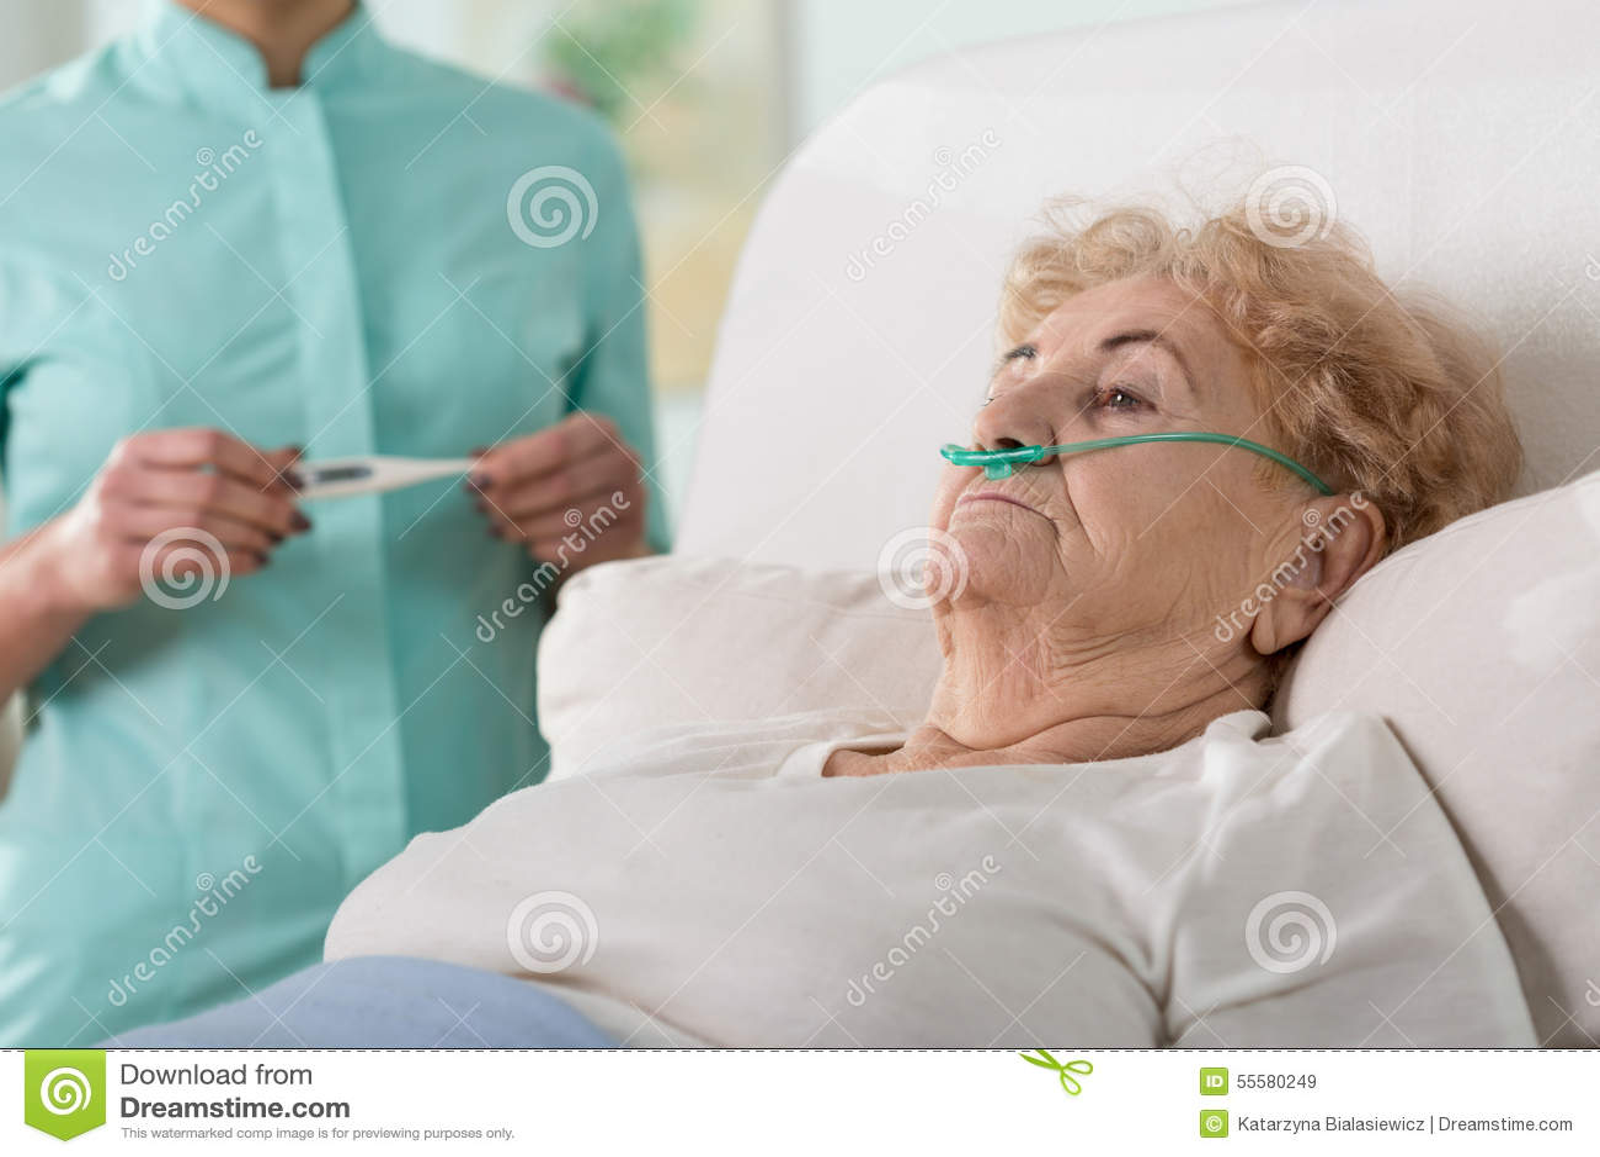 sick woman stock image image of pensioner caucasian